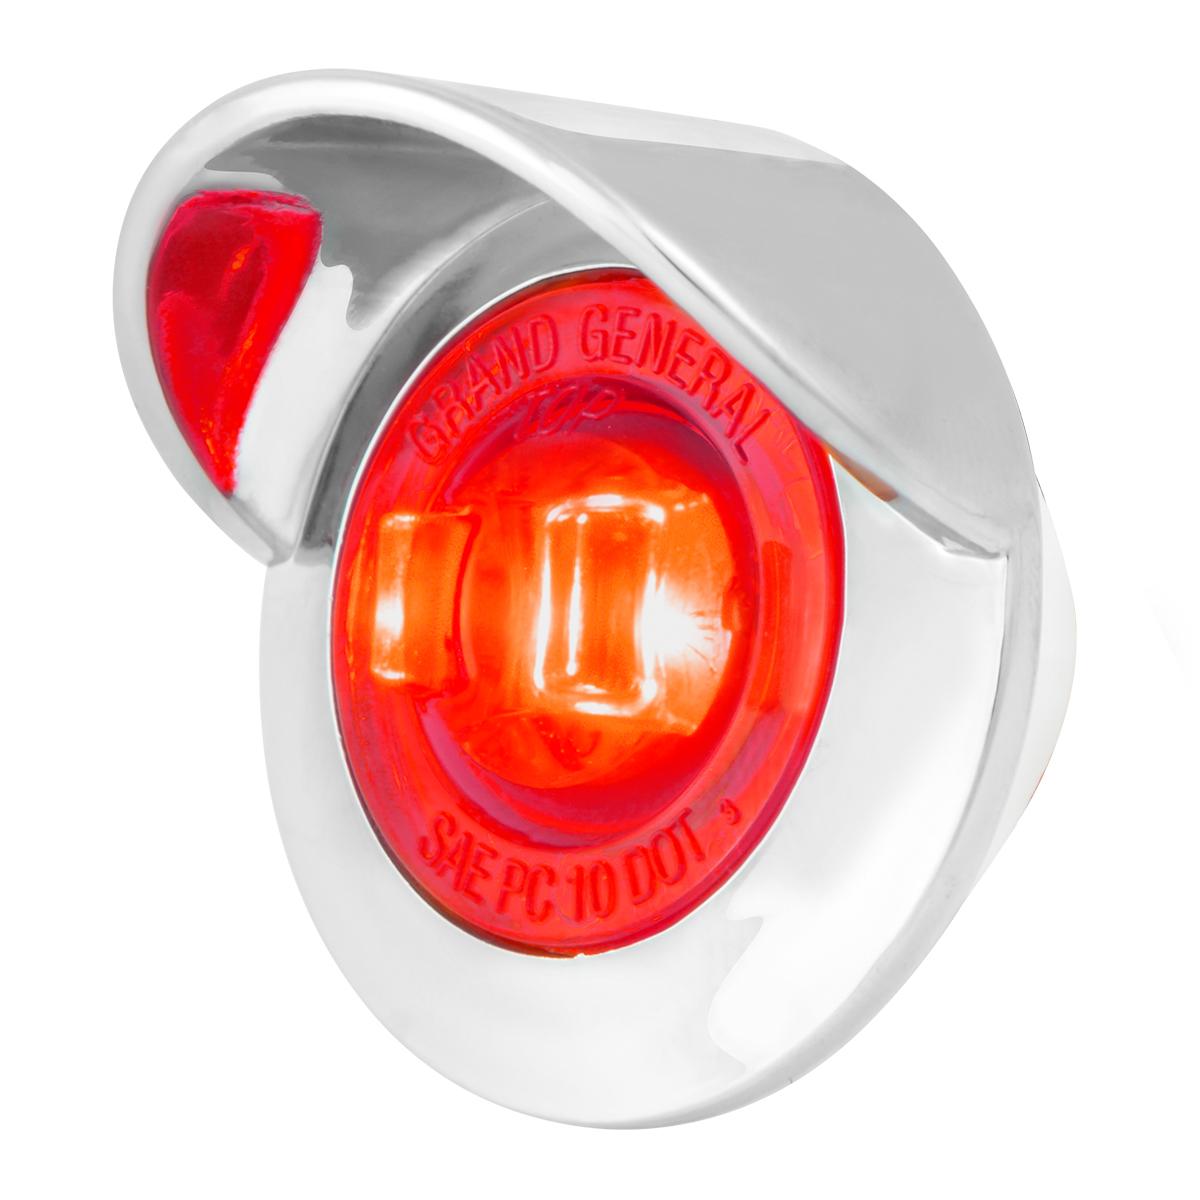 "75262 1"" Dual Function Mini Push/Screw-in Wide Angle LED Light w/ Chrome Bezel & Visor"